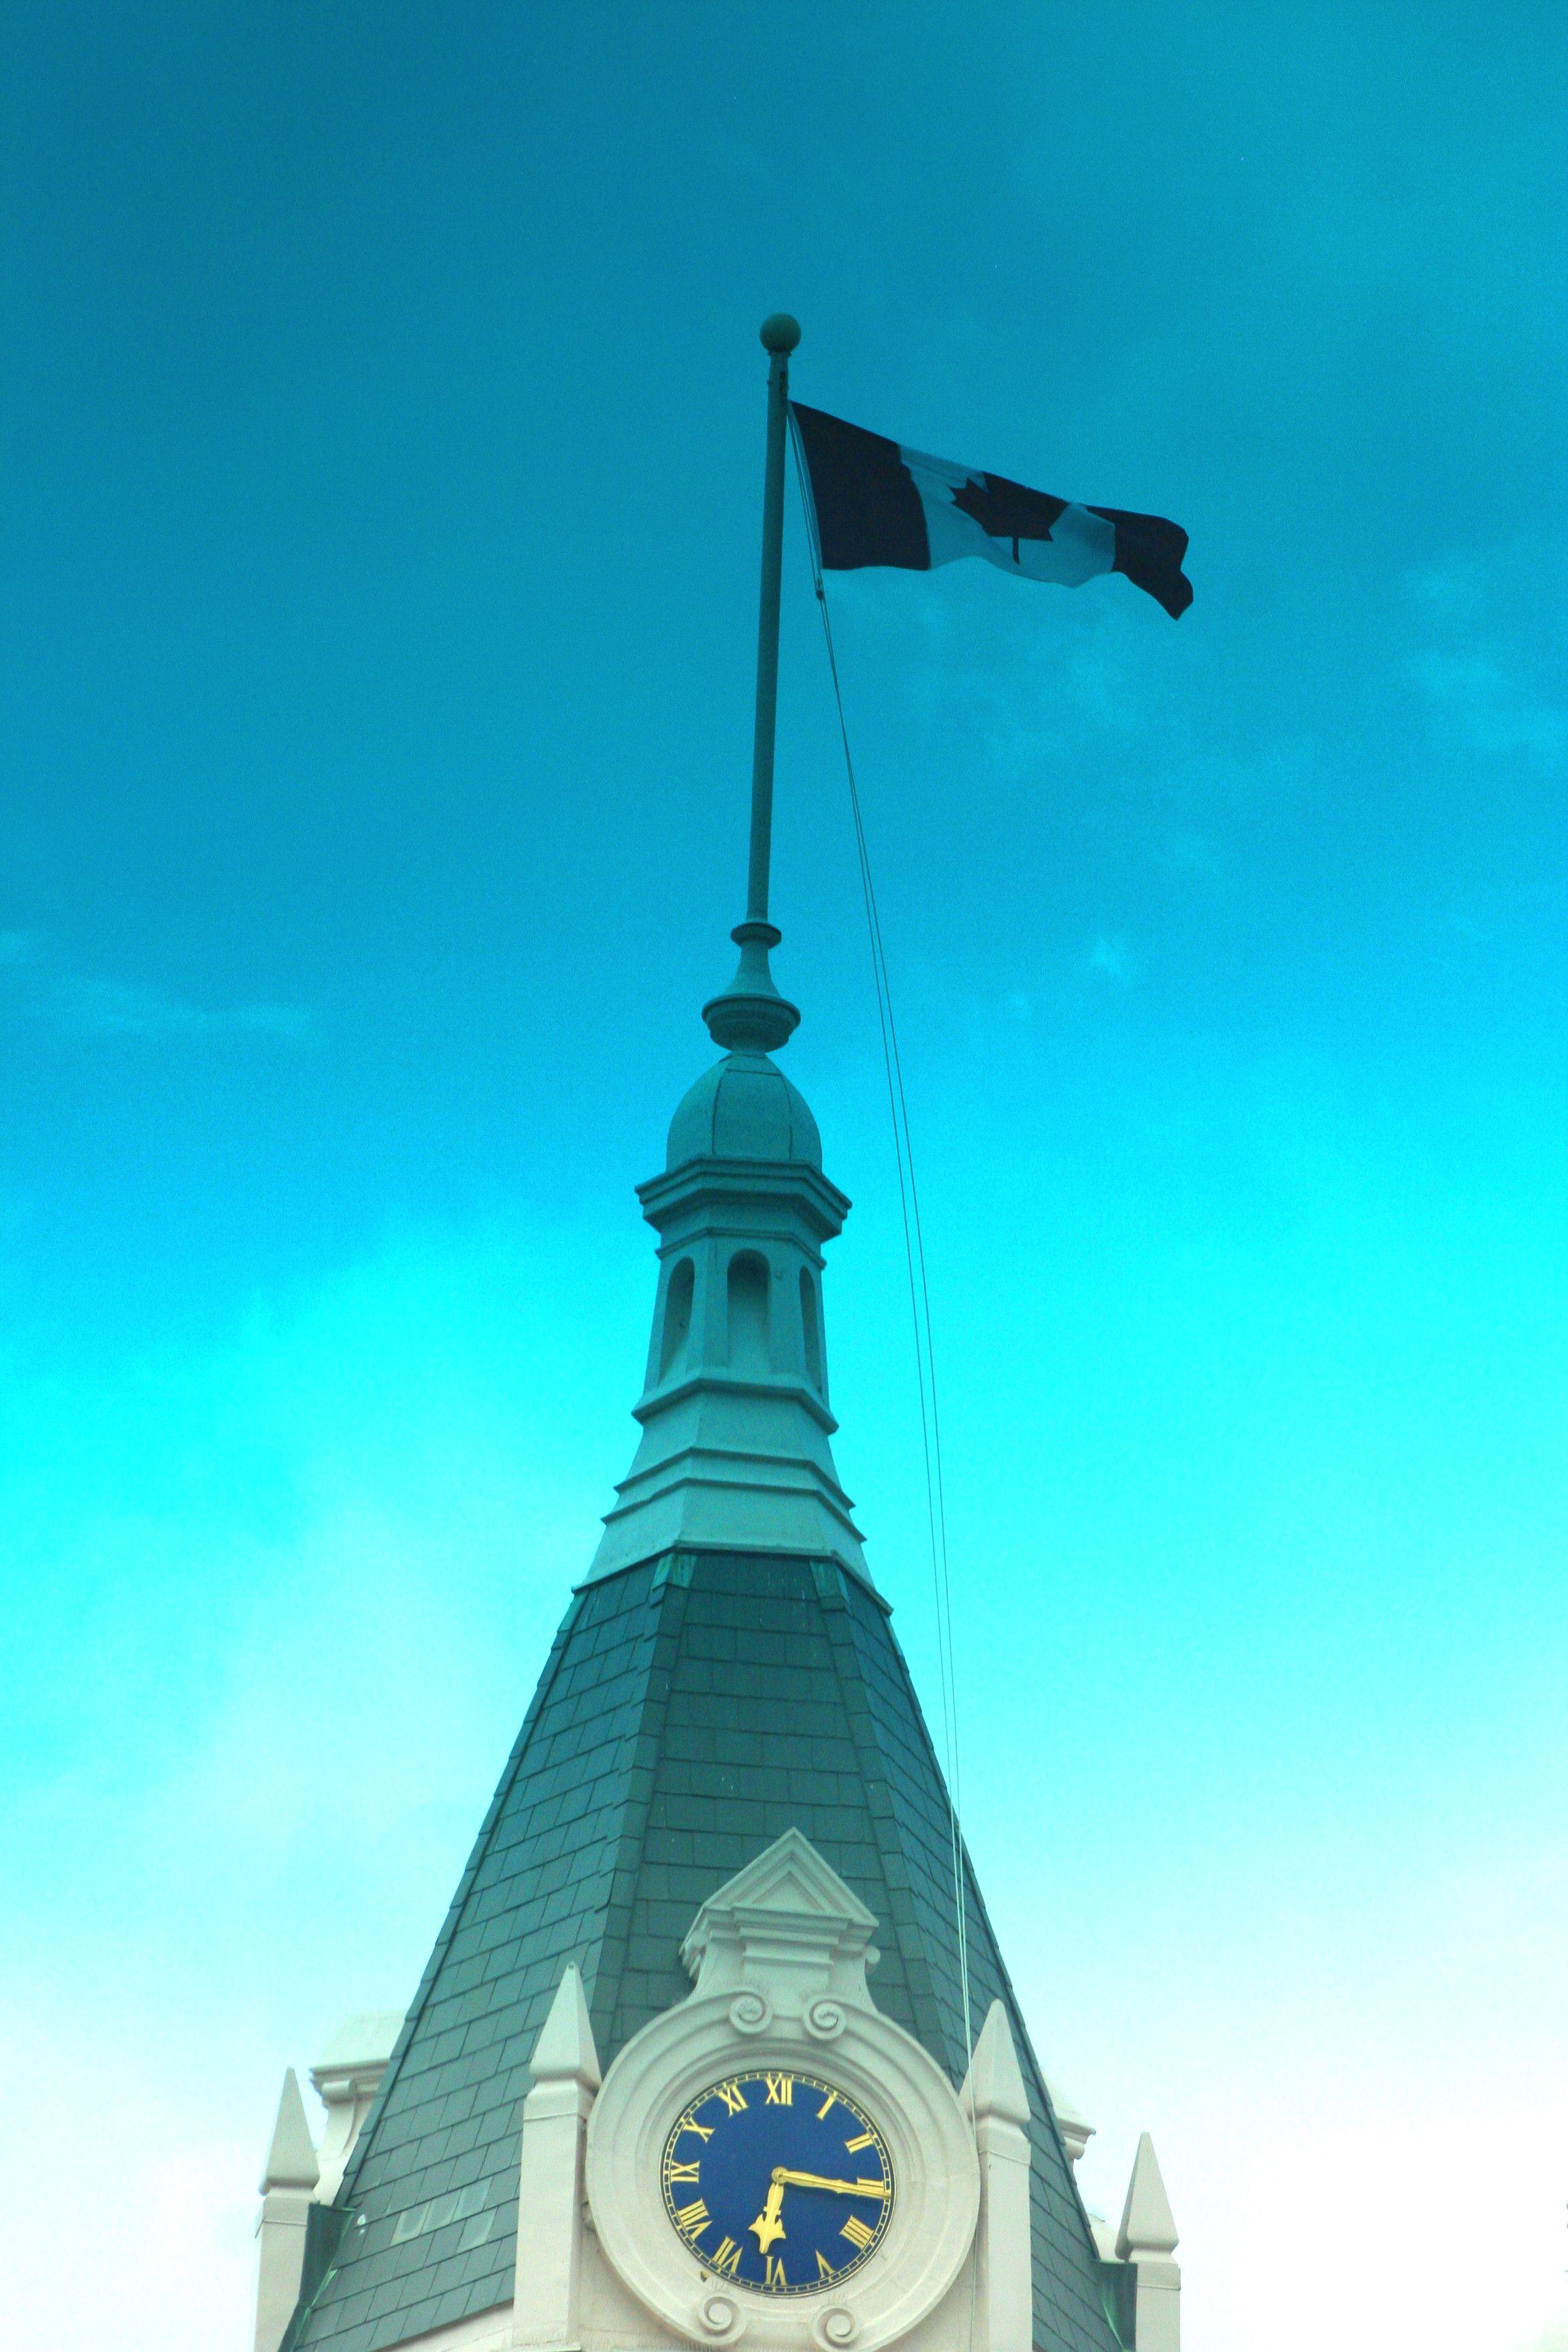 City Hall Flag, Stratford, Ontario, Canada. Taken by my